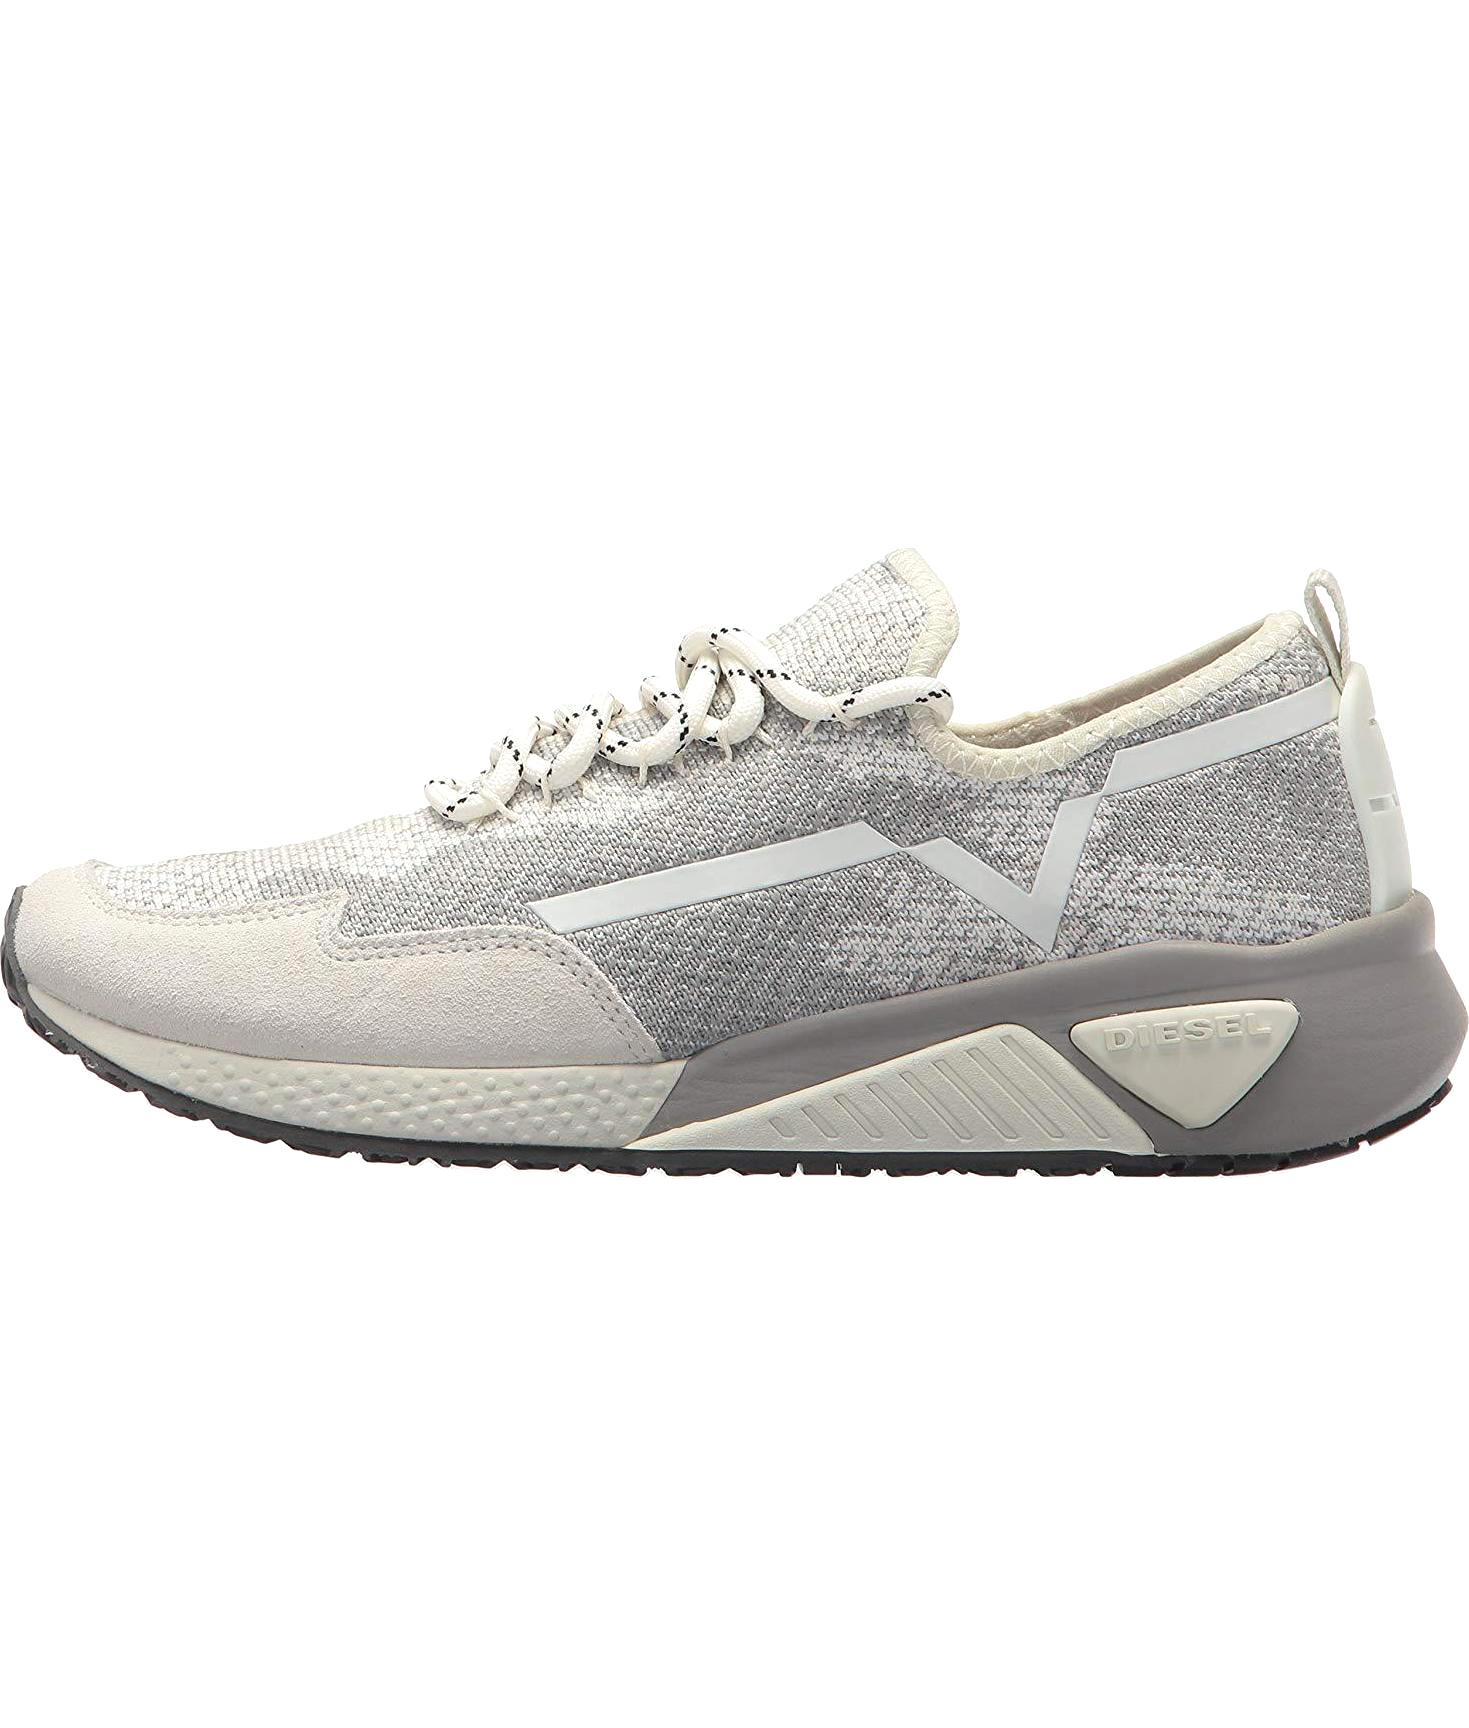 1TO9 Womens Nubuck Warm Lining Solid Gray Urethane Boots MNS03426-9 B US M